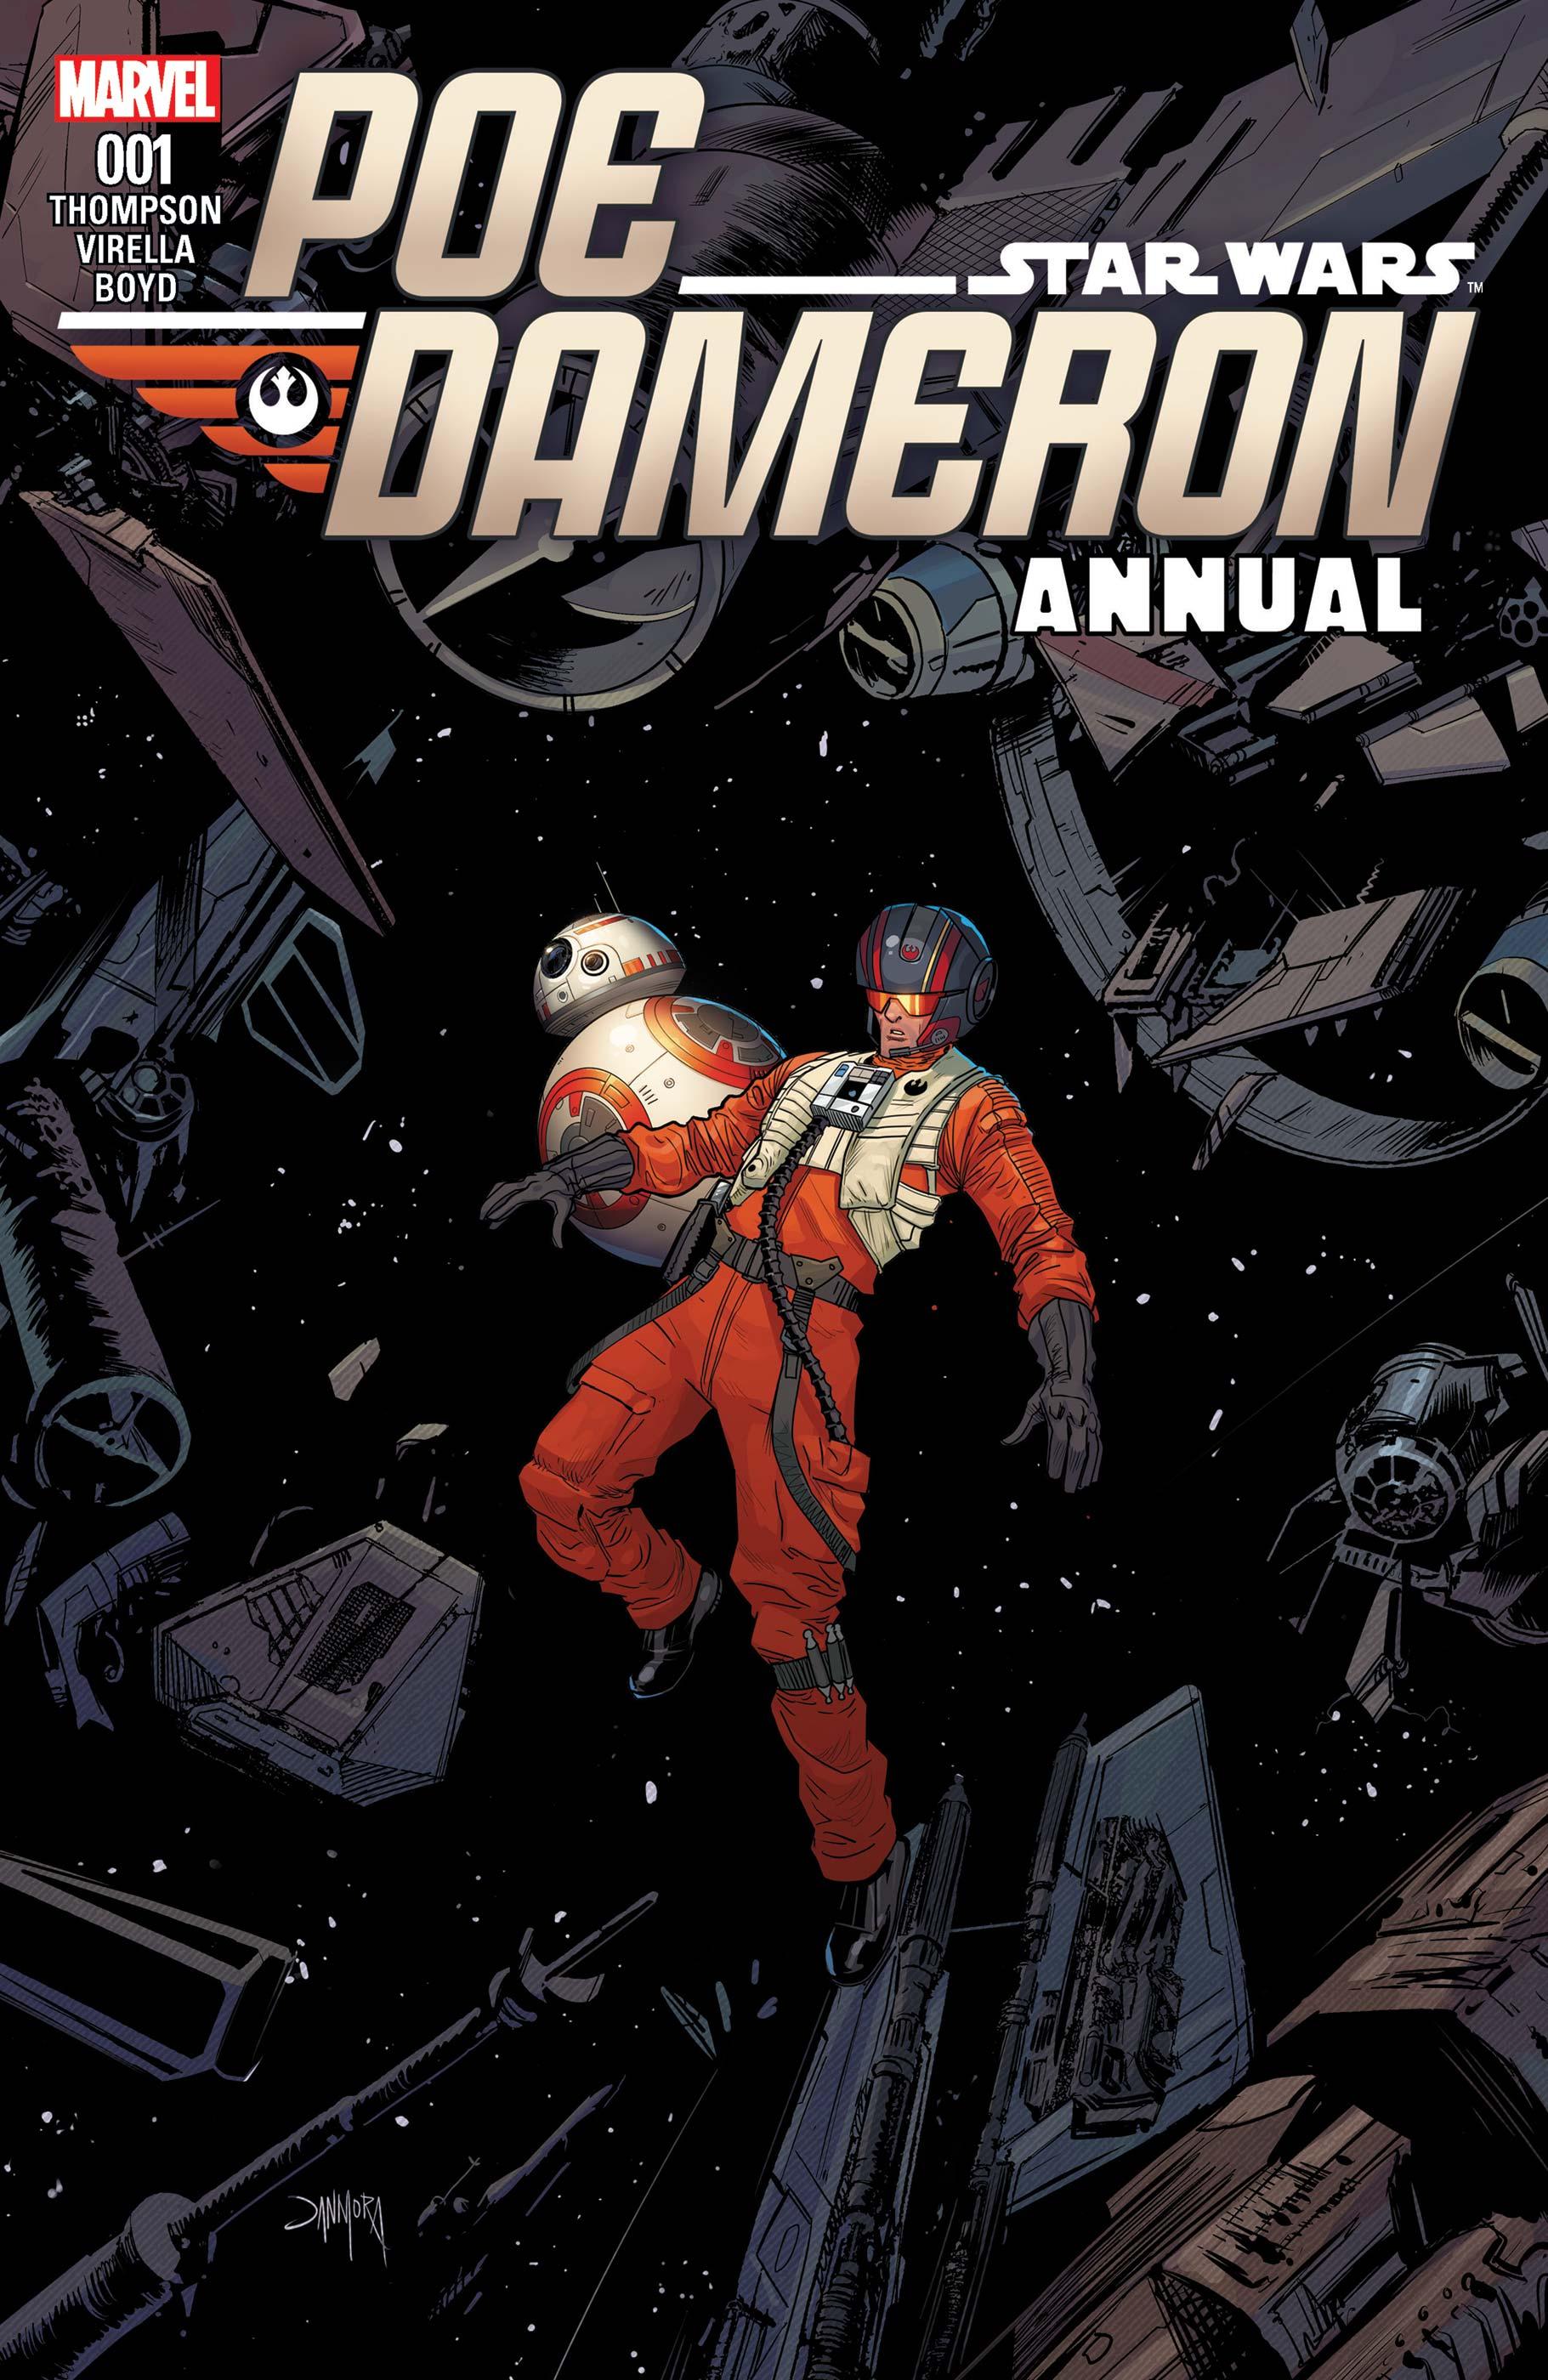 Star Wars: Poe Dameron Annual (2017) #1